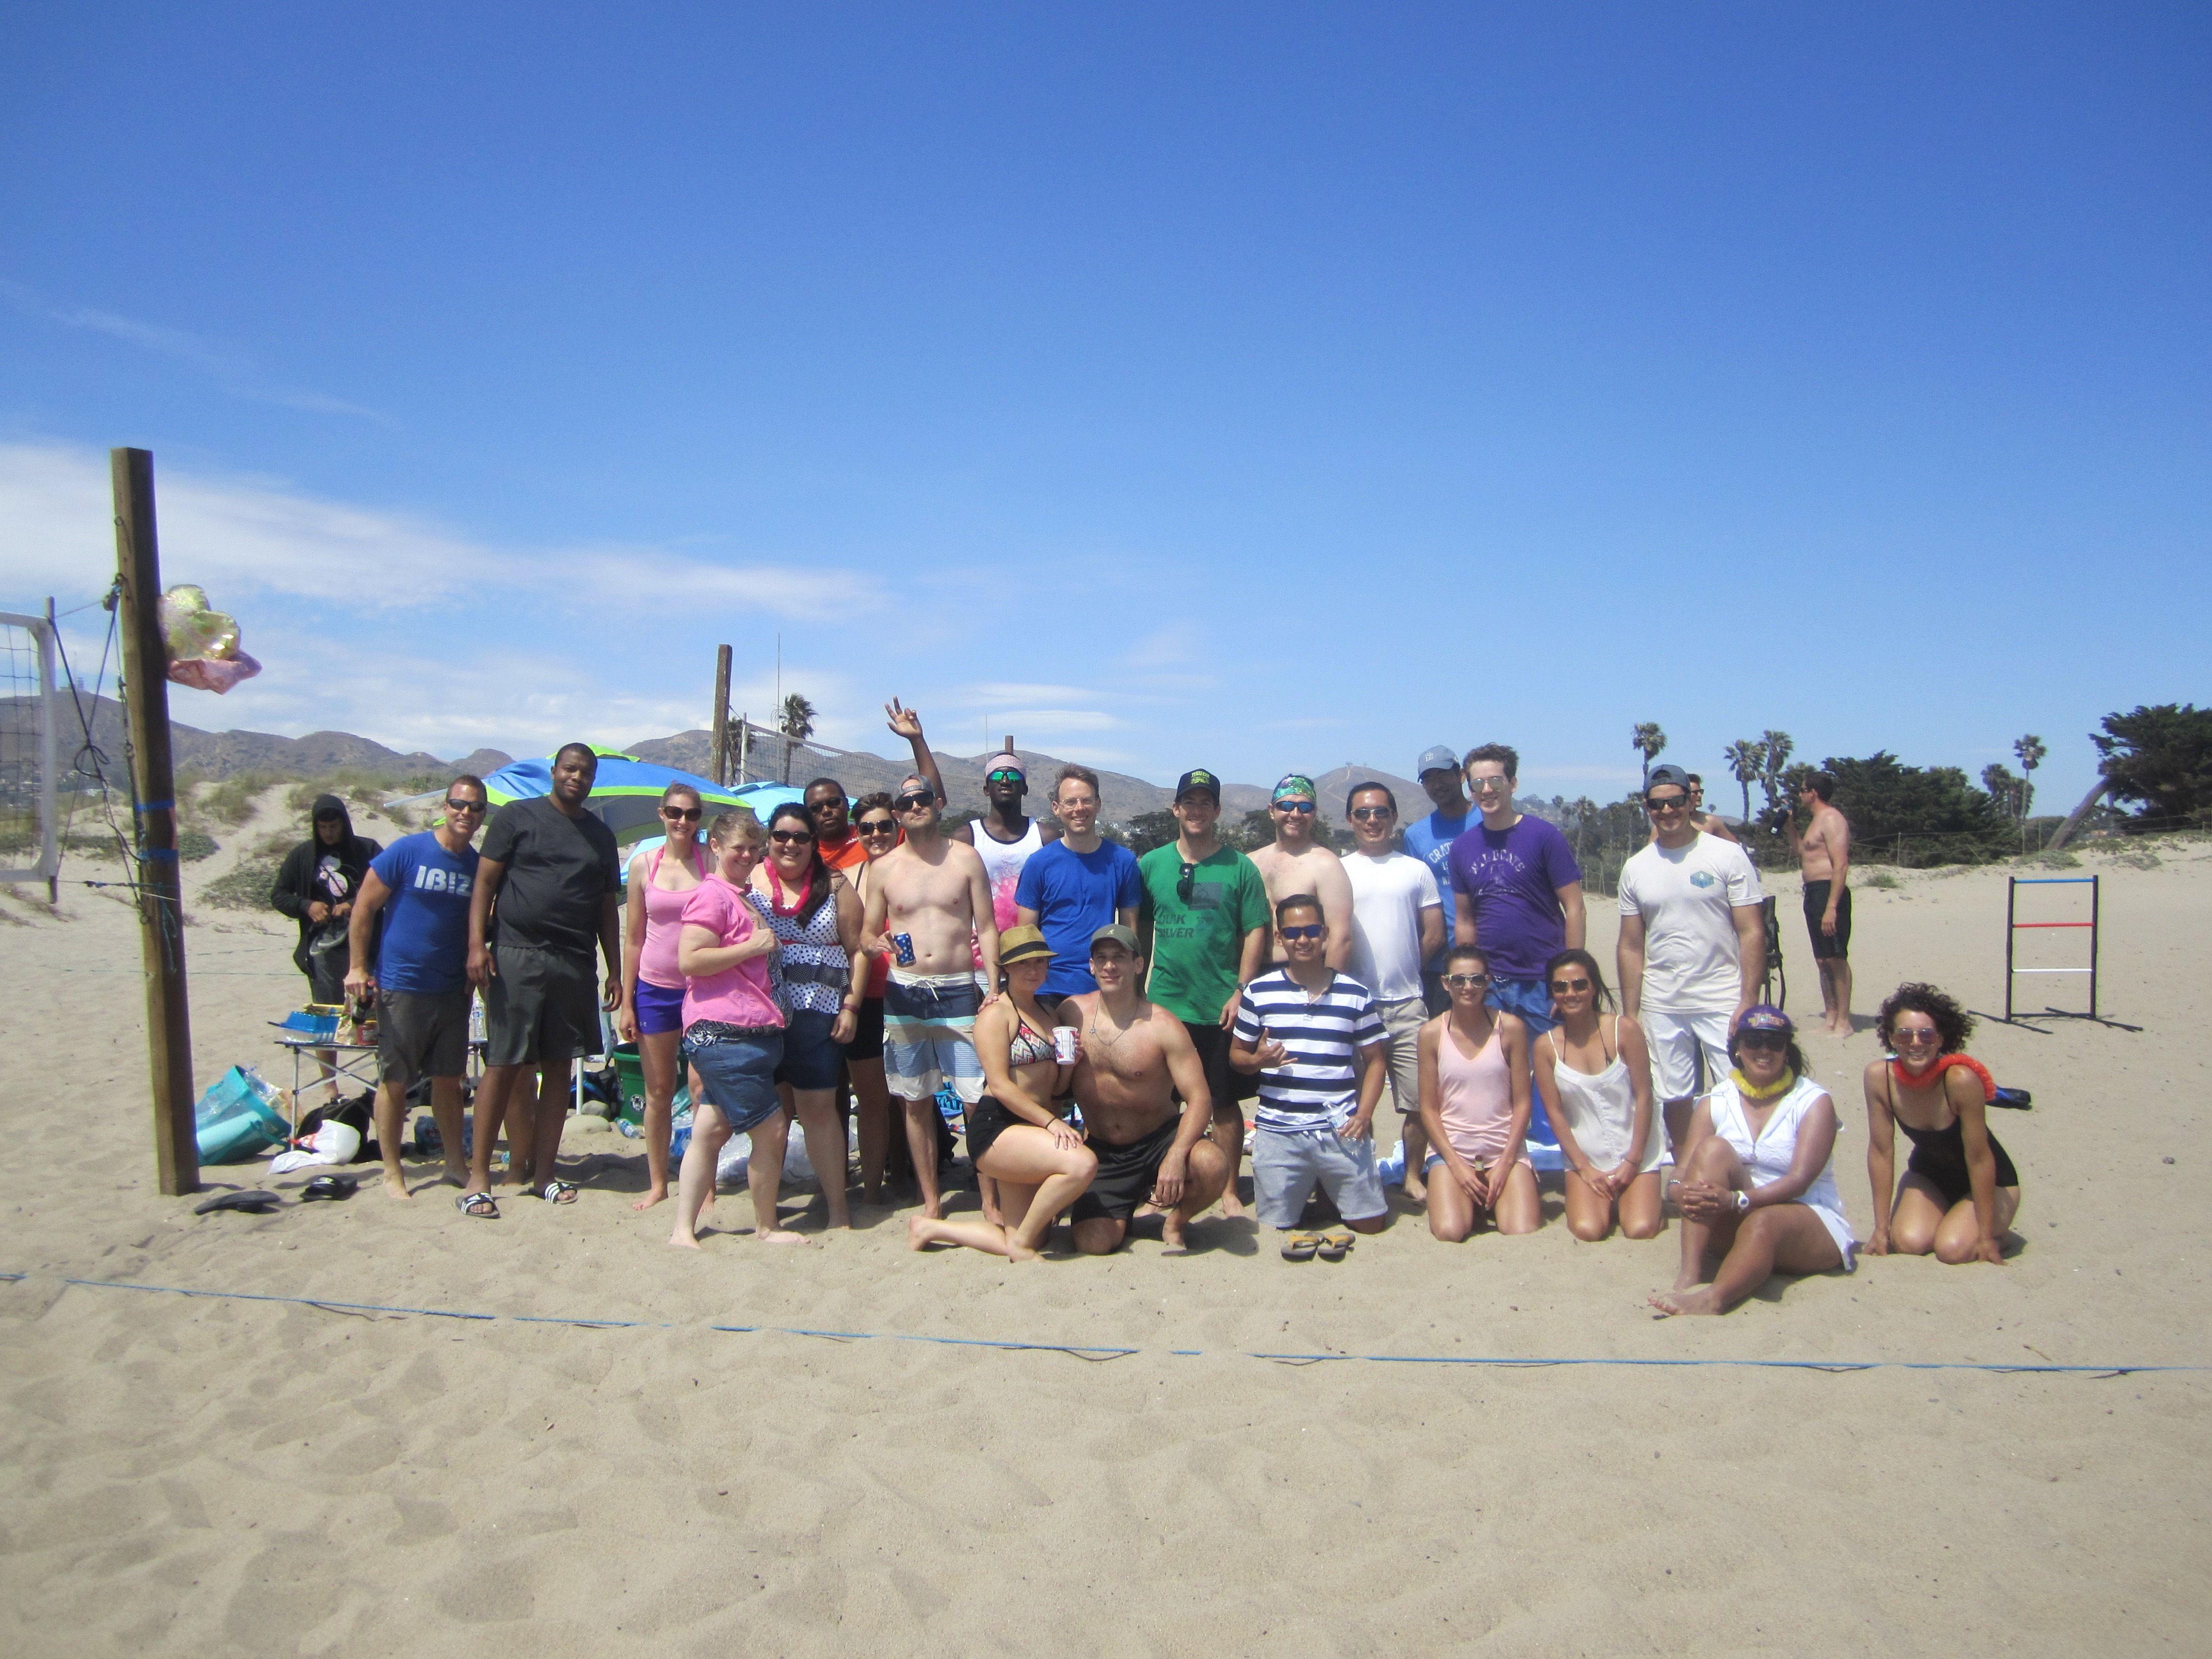 Ventura Beach Bums, 20's-30's